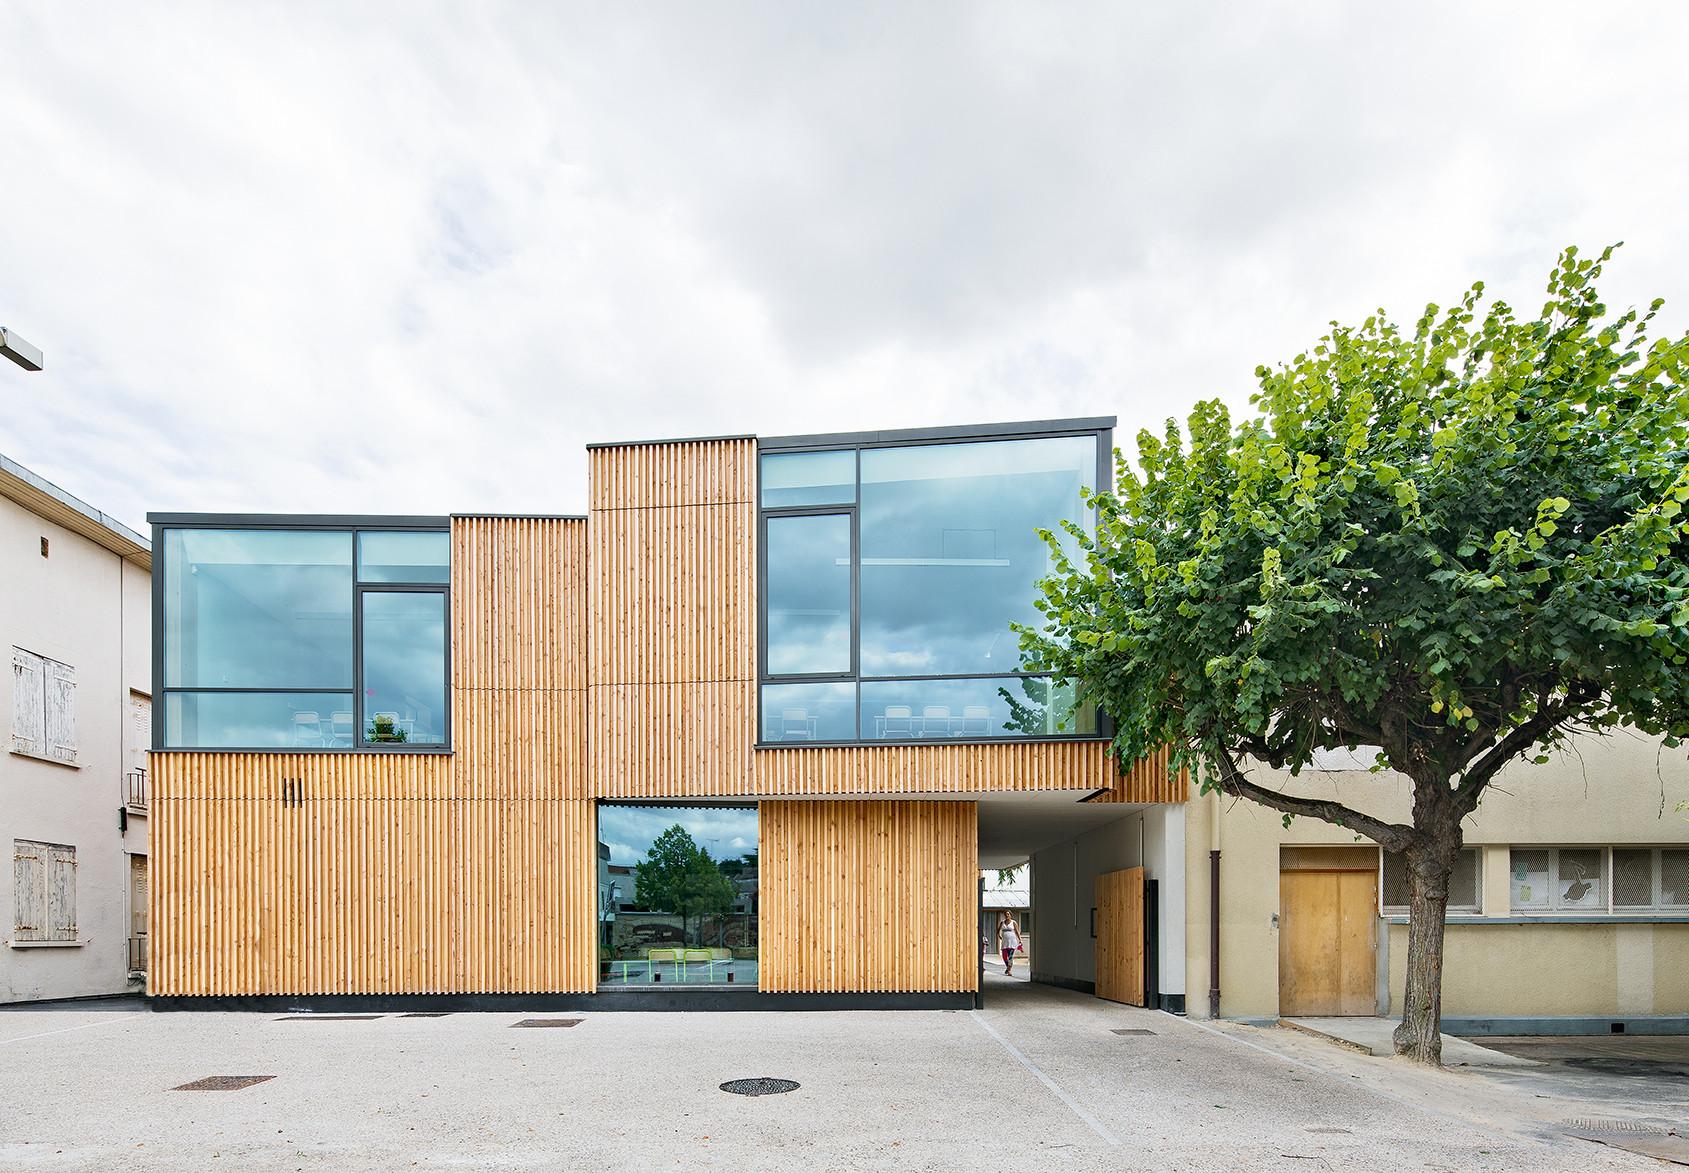 Ablon sur seine reception and leisure centre nomade for Architecture nomade